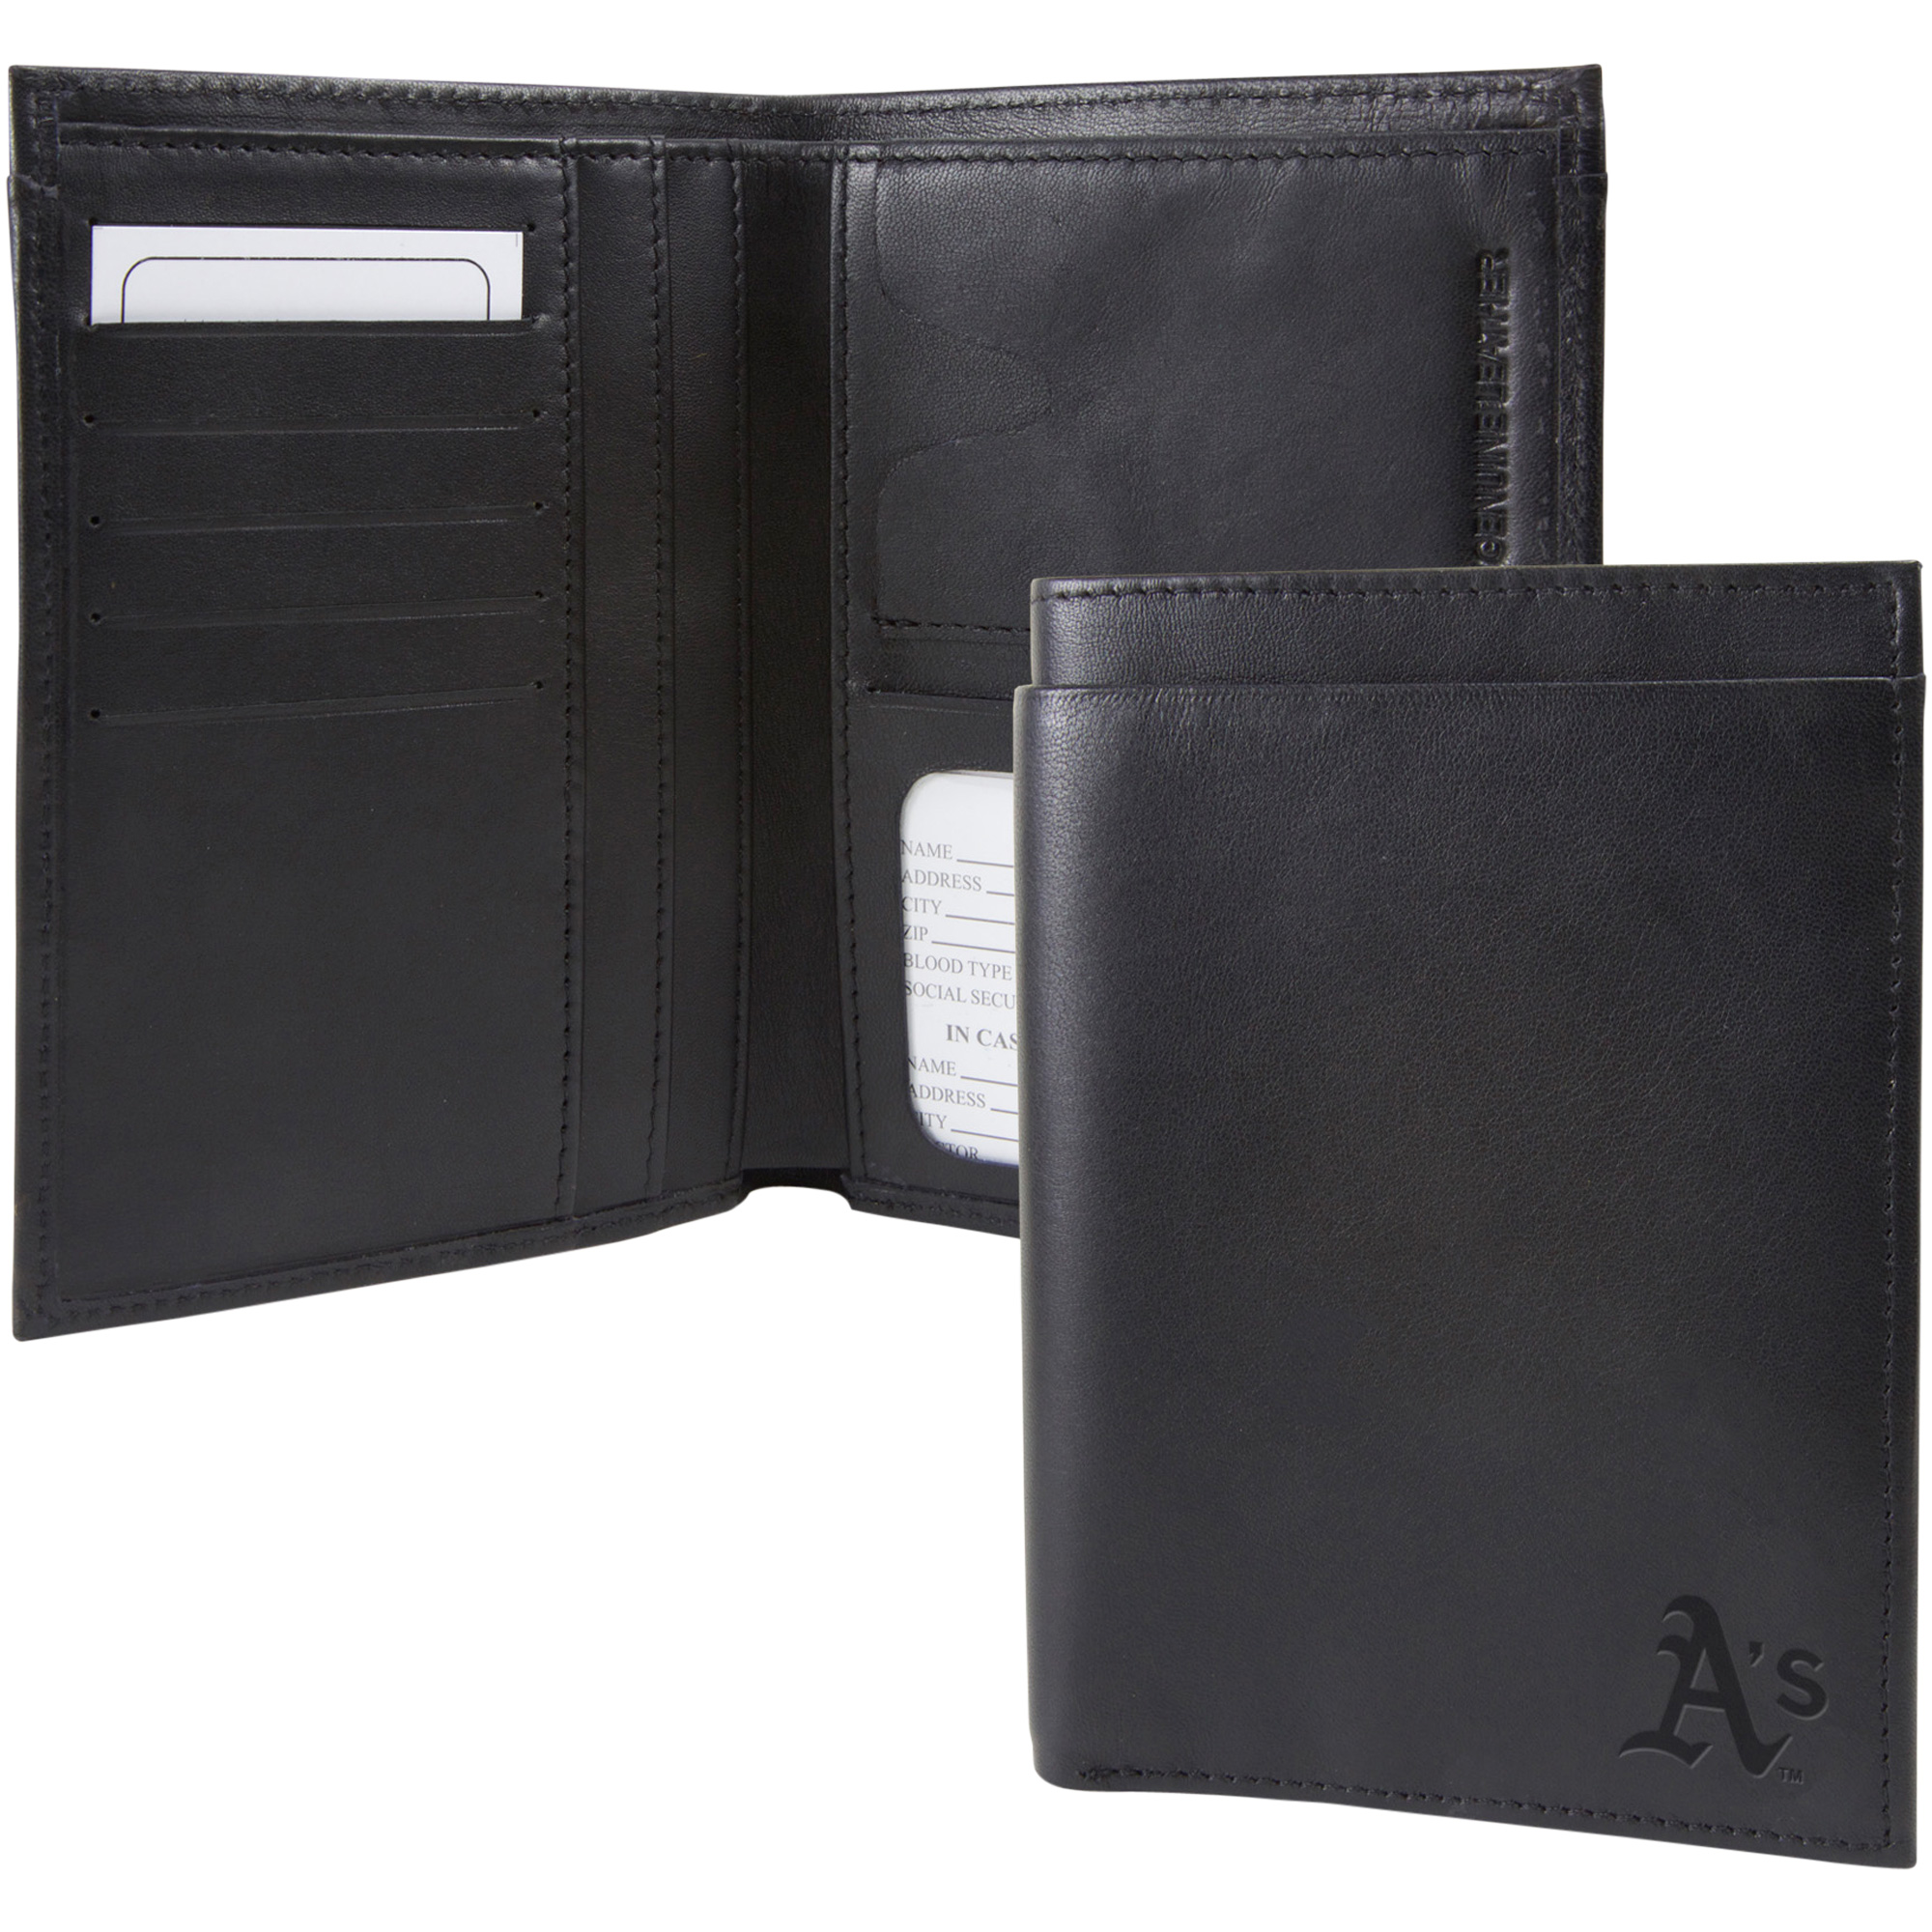 Oakland Athletics Traveling Team Passport Wallet - Black - No Size